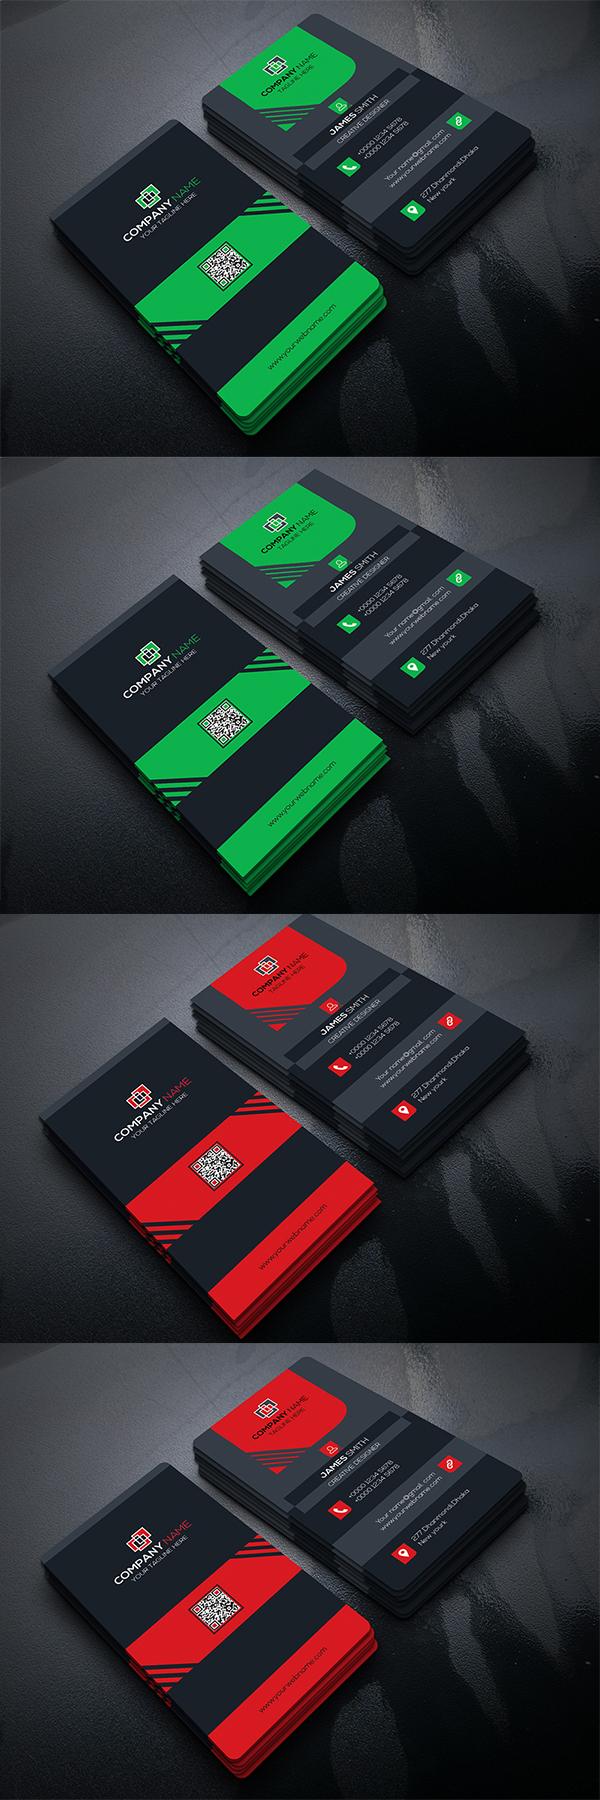 05 Business Card Design